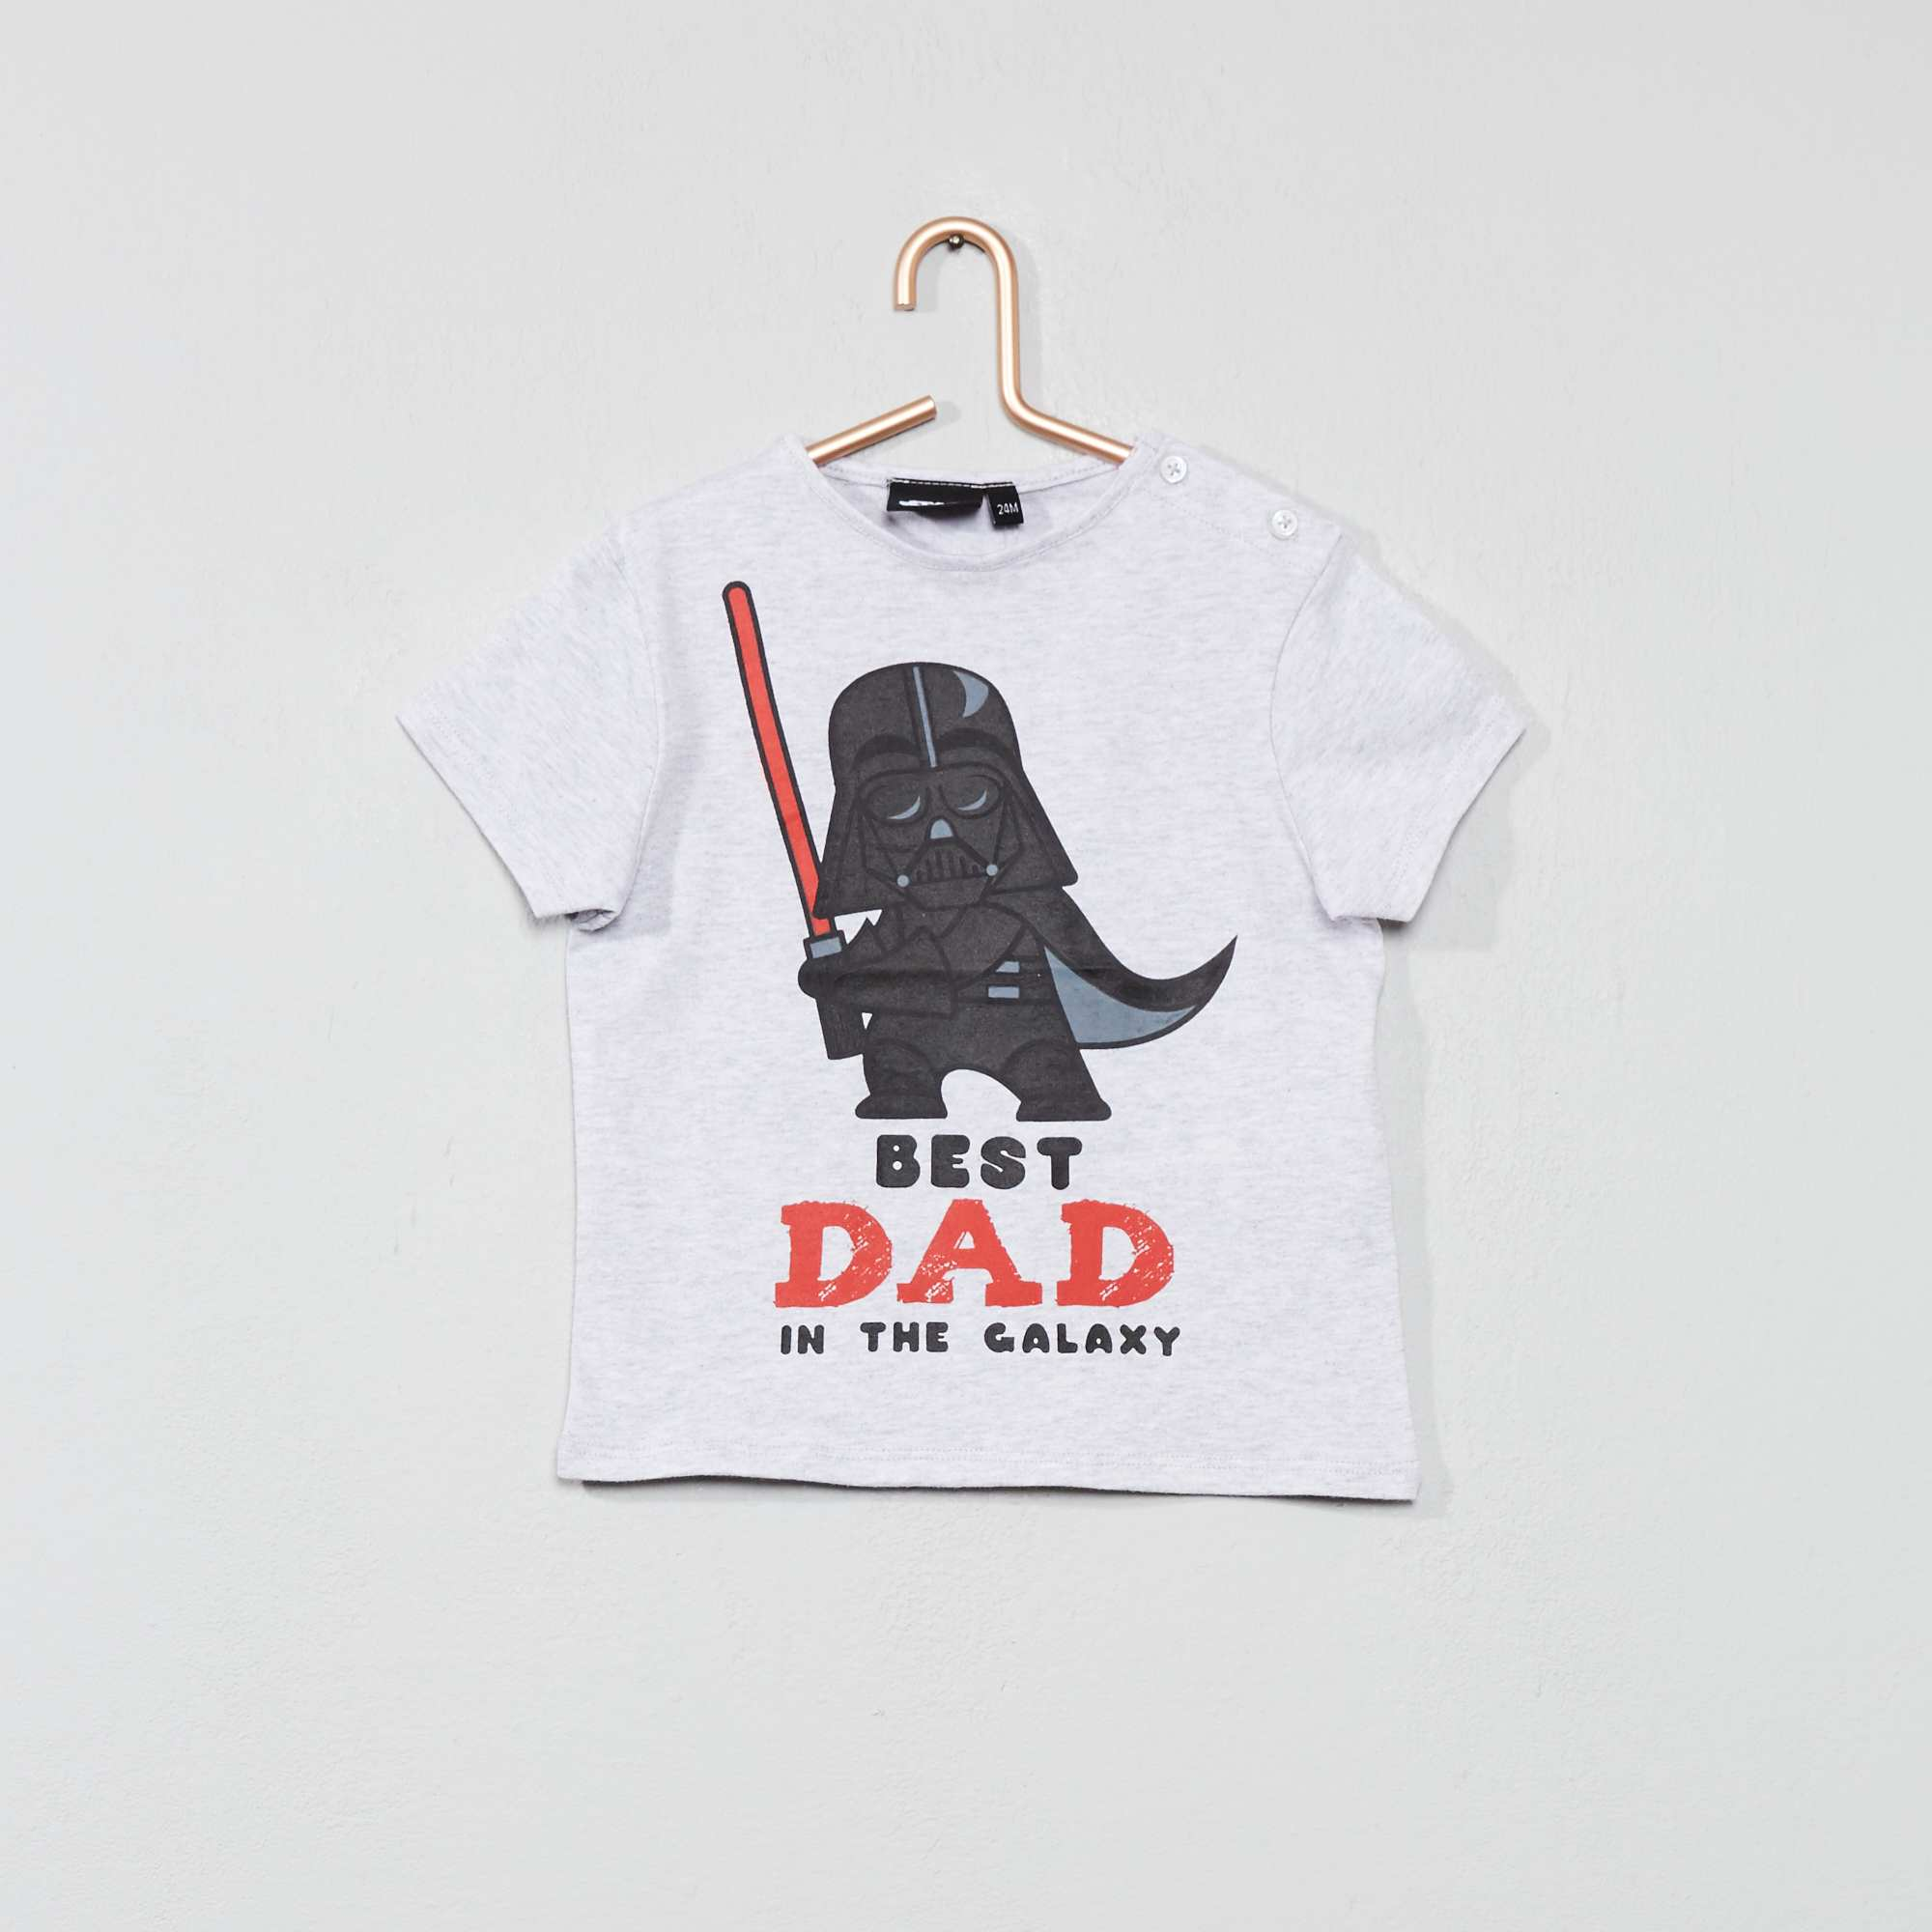 9420f2f16ad5c T-shirt 'Star Wars' Bébé garçon - gris chiné - Kiabi - 7,00€